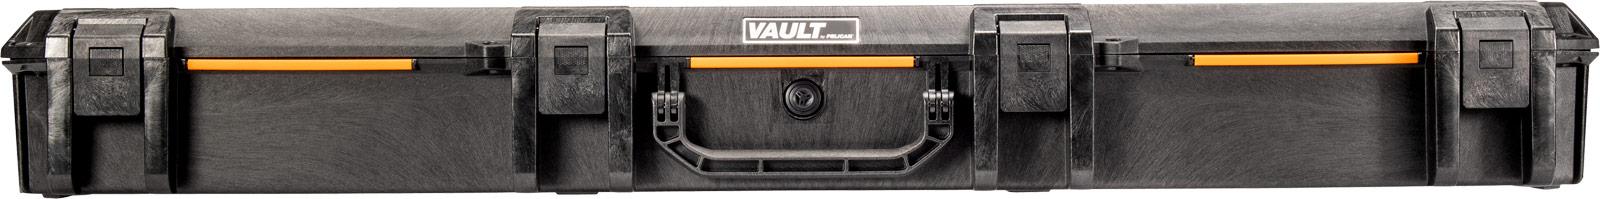 pelican vault v770 long weapon case